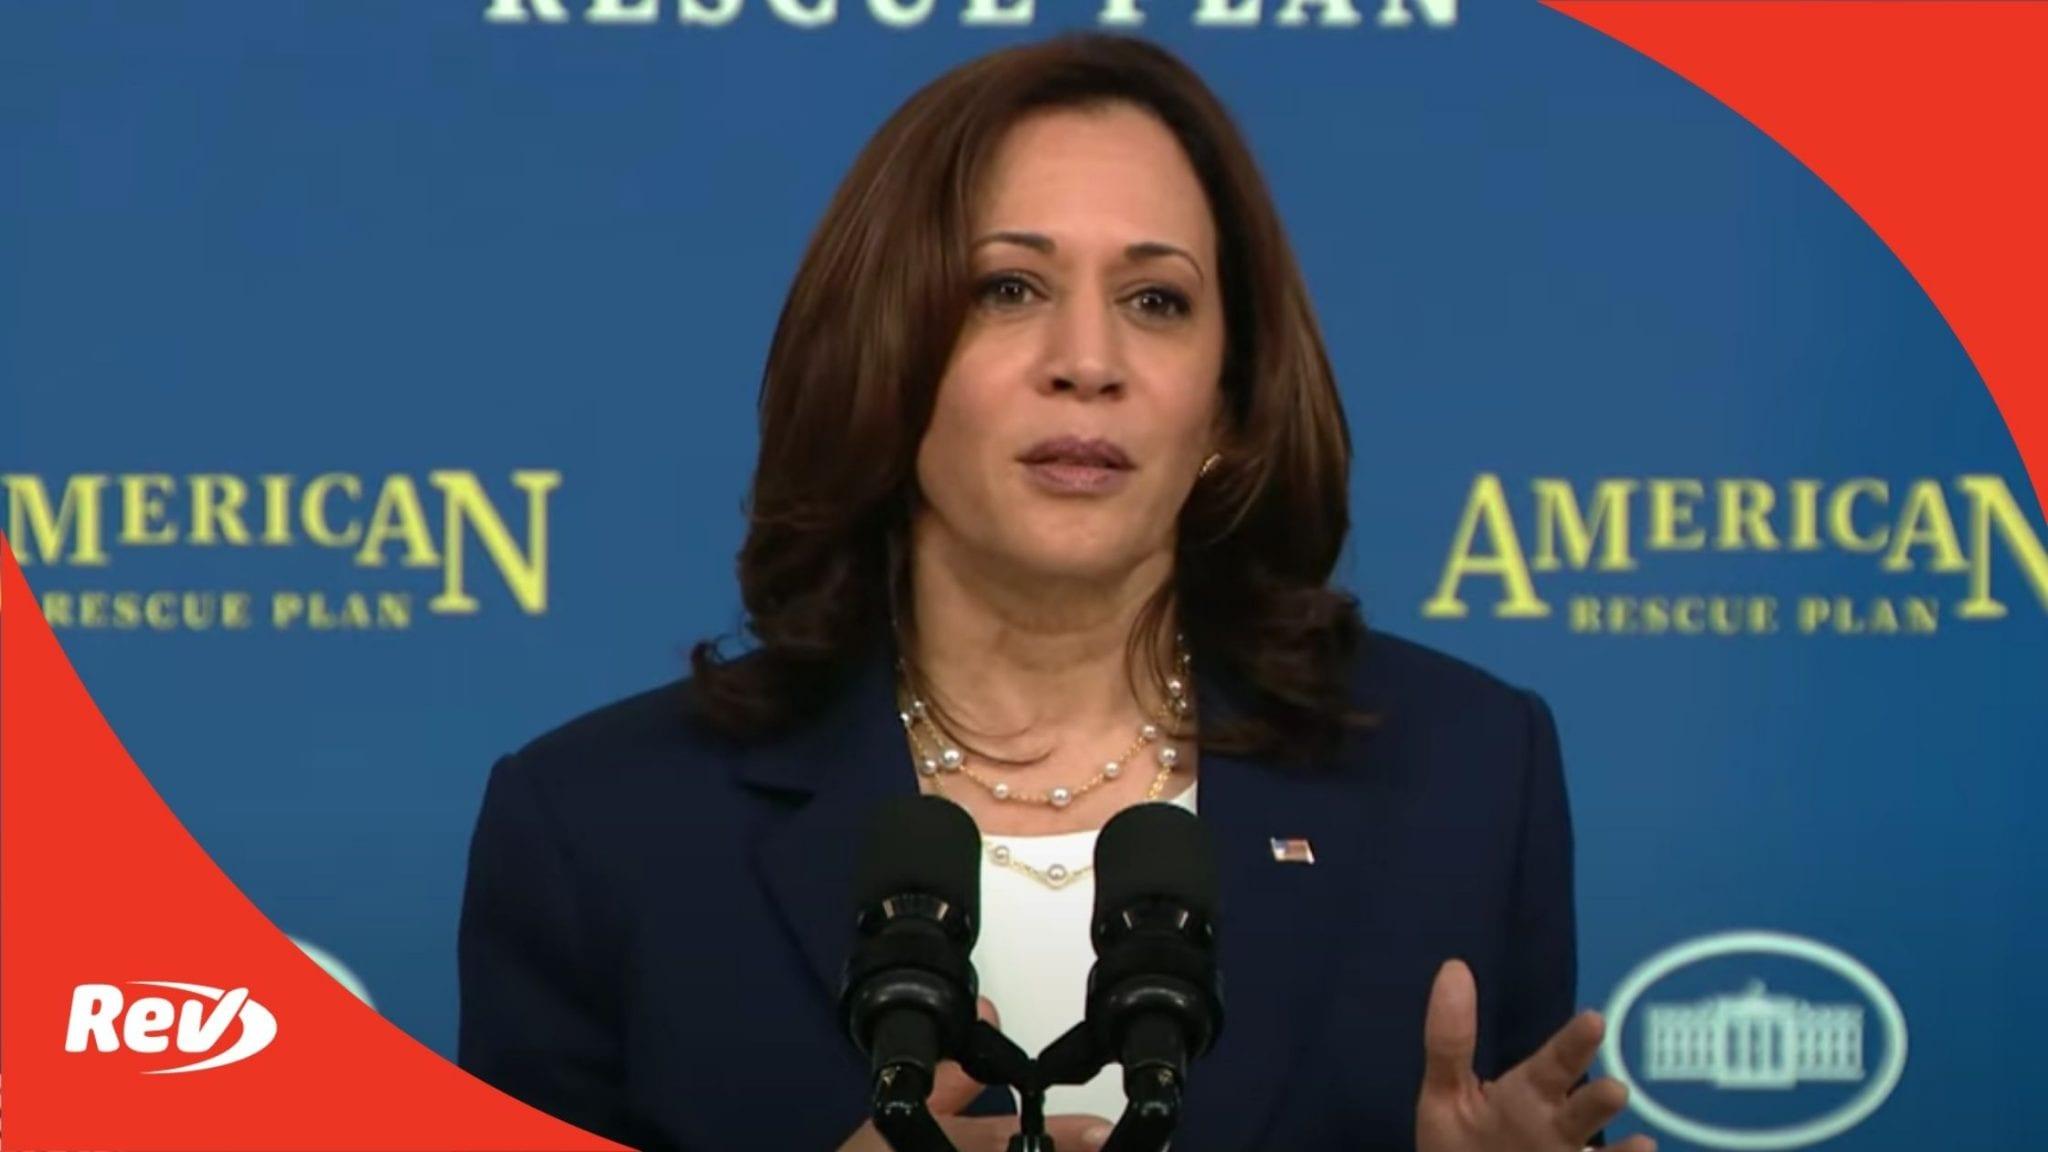 Kamala Harris Speech Transcript April 15: American Rescue Plan's Investment in Child Care